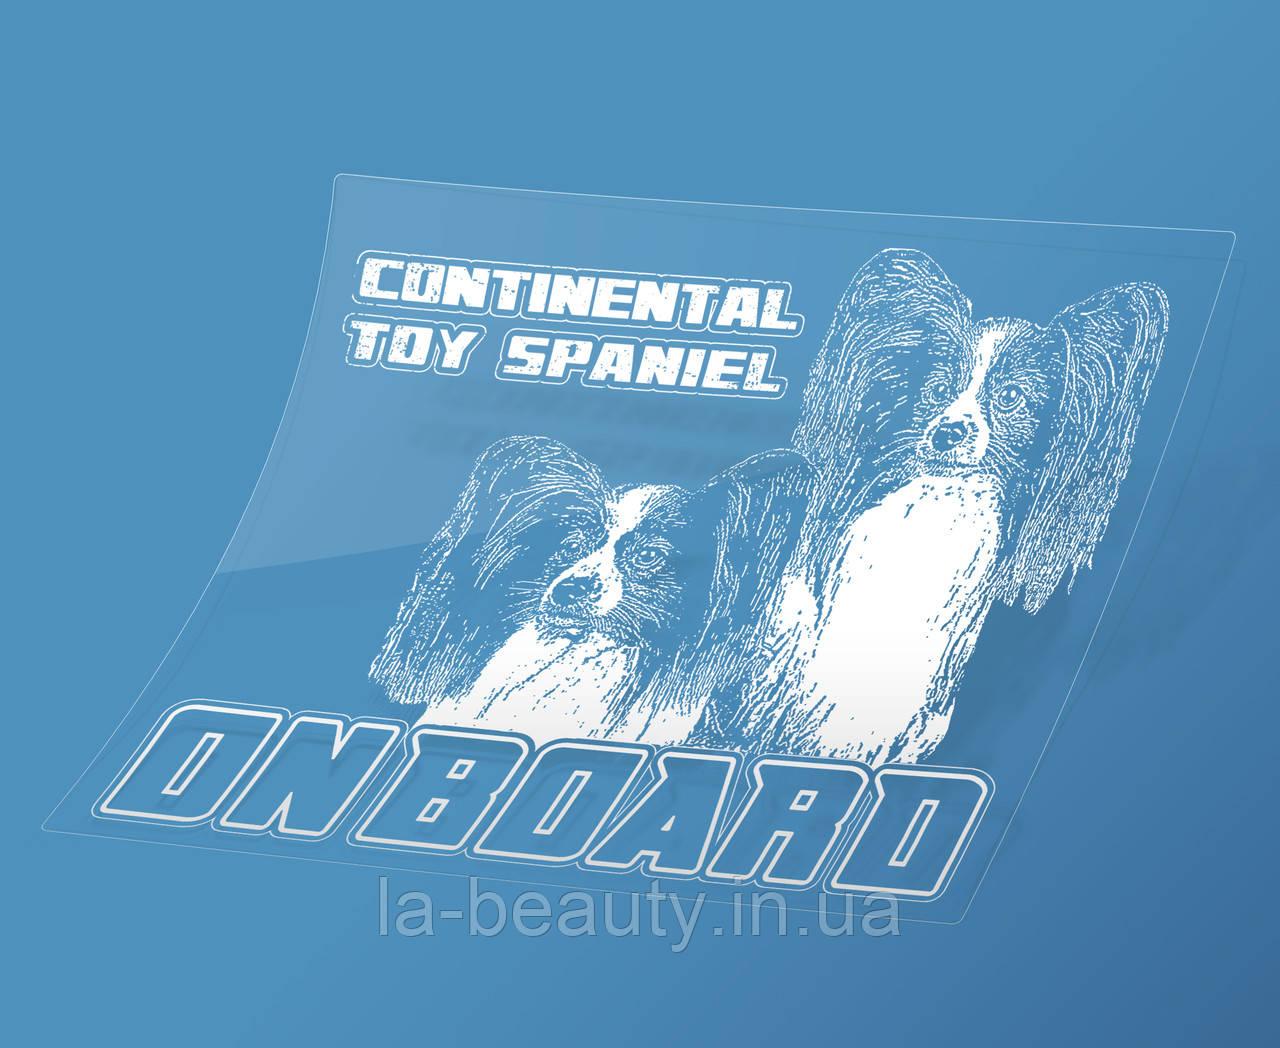 Наклейка на машину/авто Папийон на борту (Continental Toy Spaniel (Papillion) on Board)